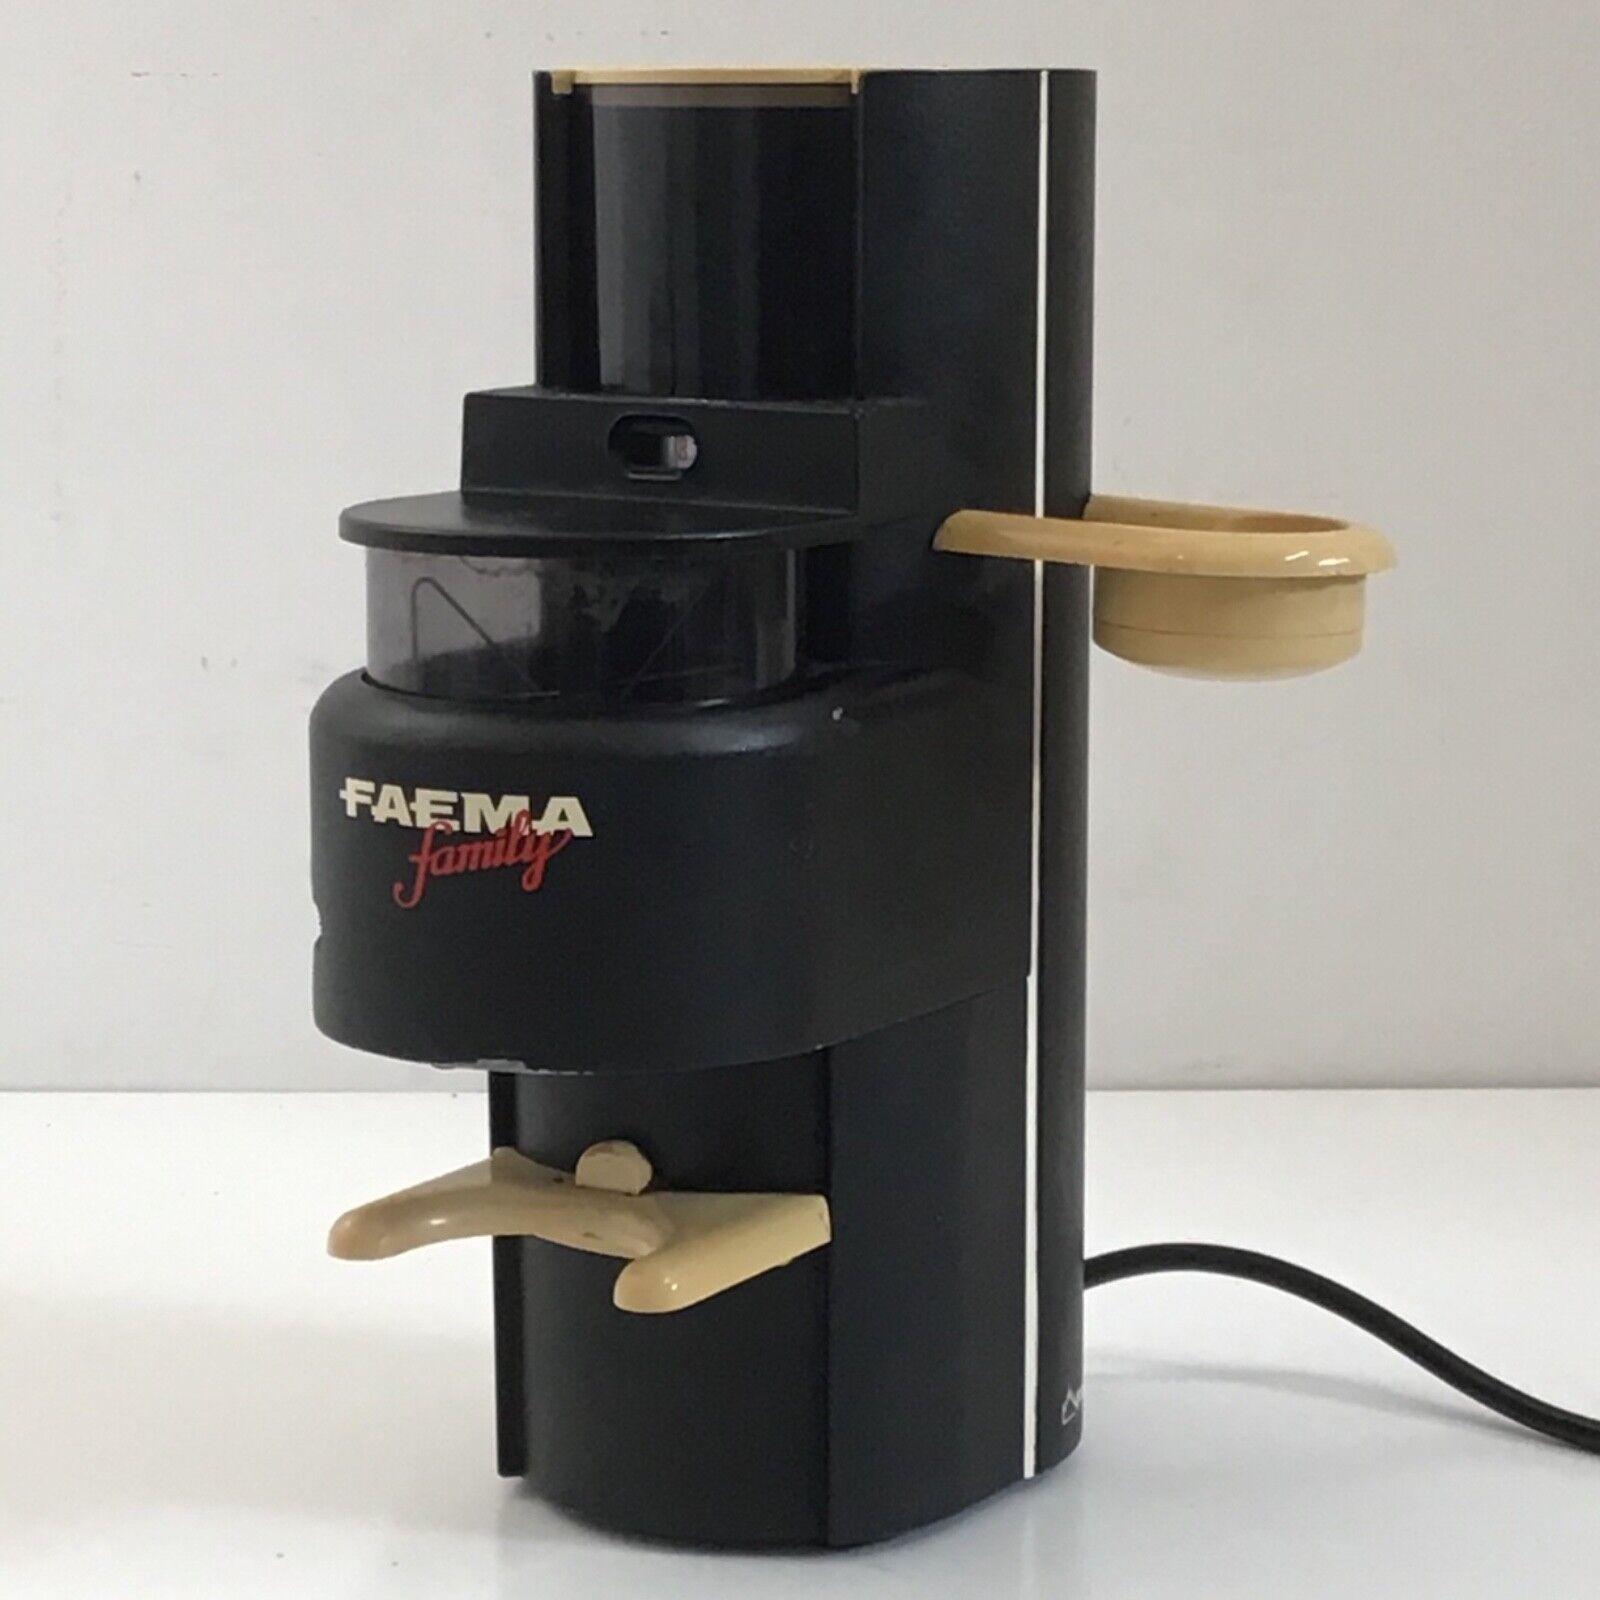 MACINA CAFFE' MACCHINA FAEMA FAMILY COFFEE GRINDER VINTAGE la pavoni gaggia